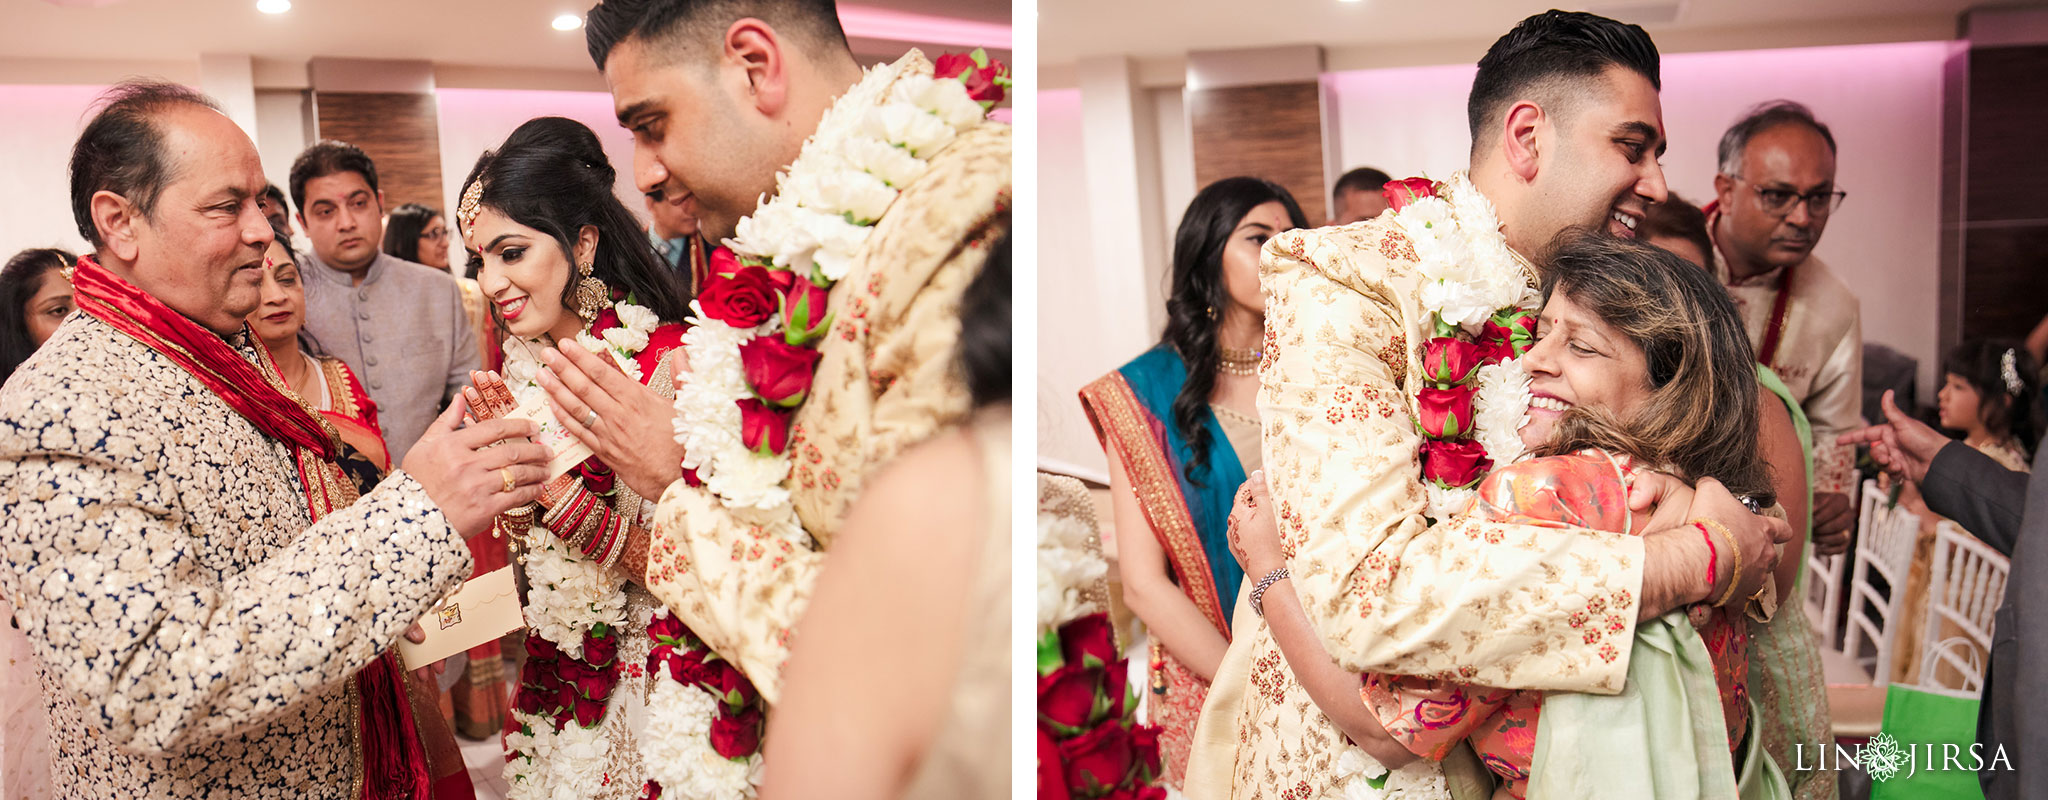 15 Metropol Glendale Indian Wedding Photography